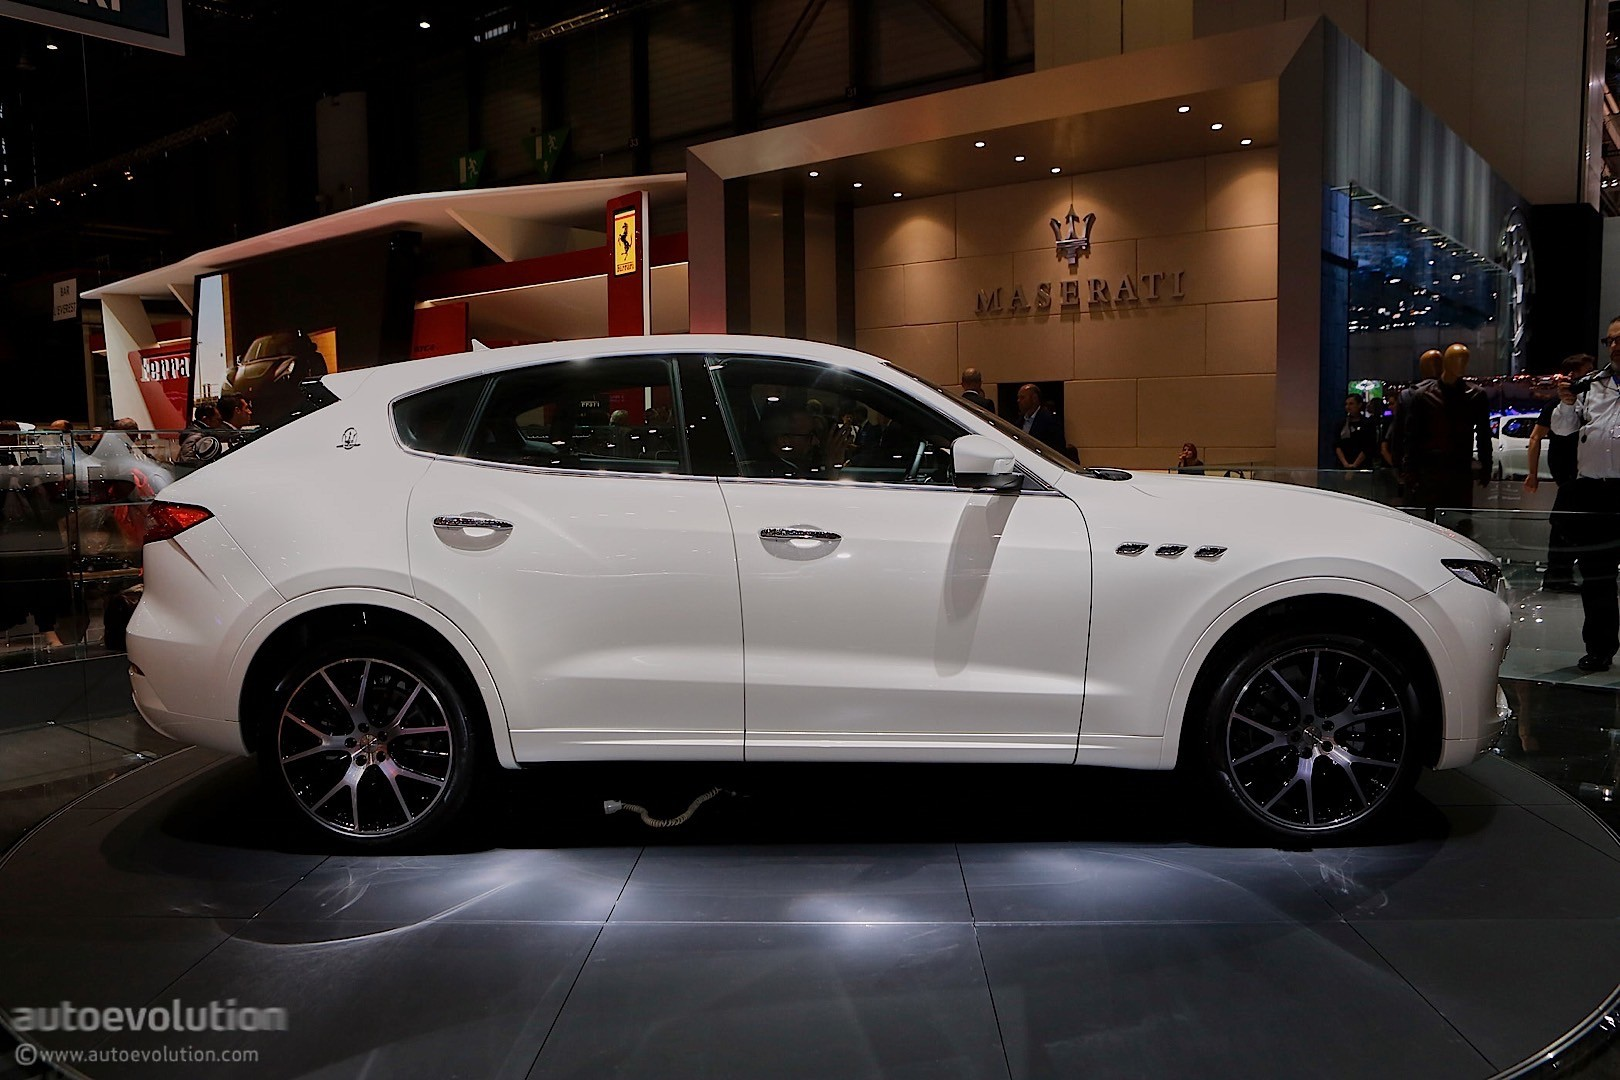 Best Suv For The Money >> Maserati Levante SUV Looks like a Ghibli on Stilts in Geneva - autoevolution